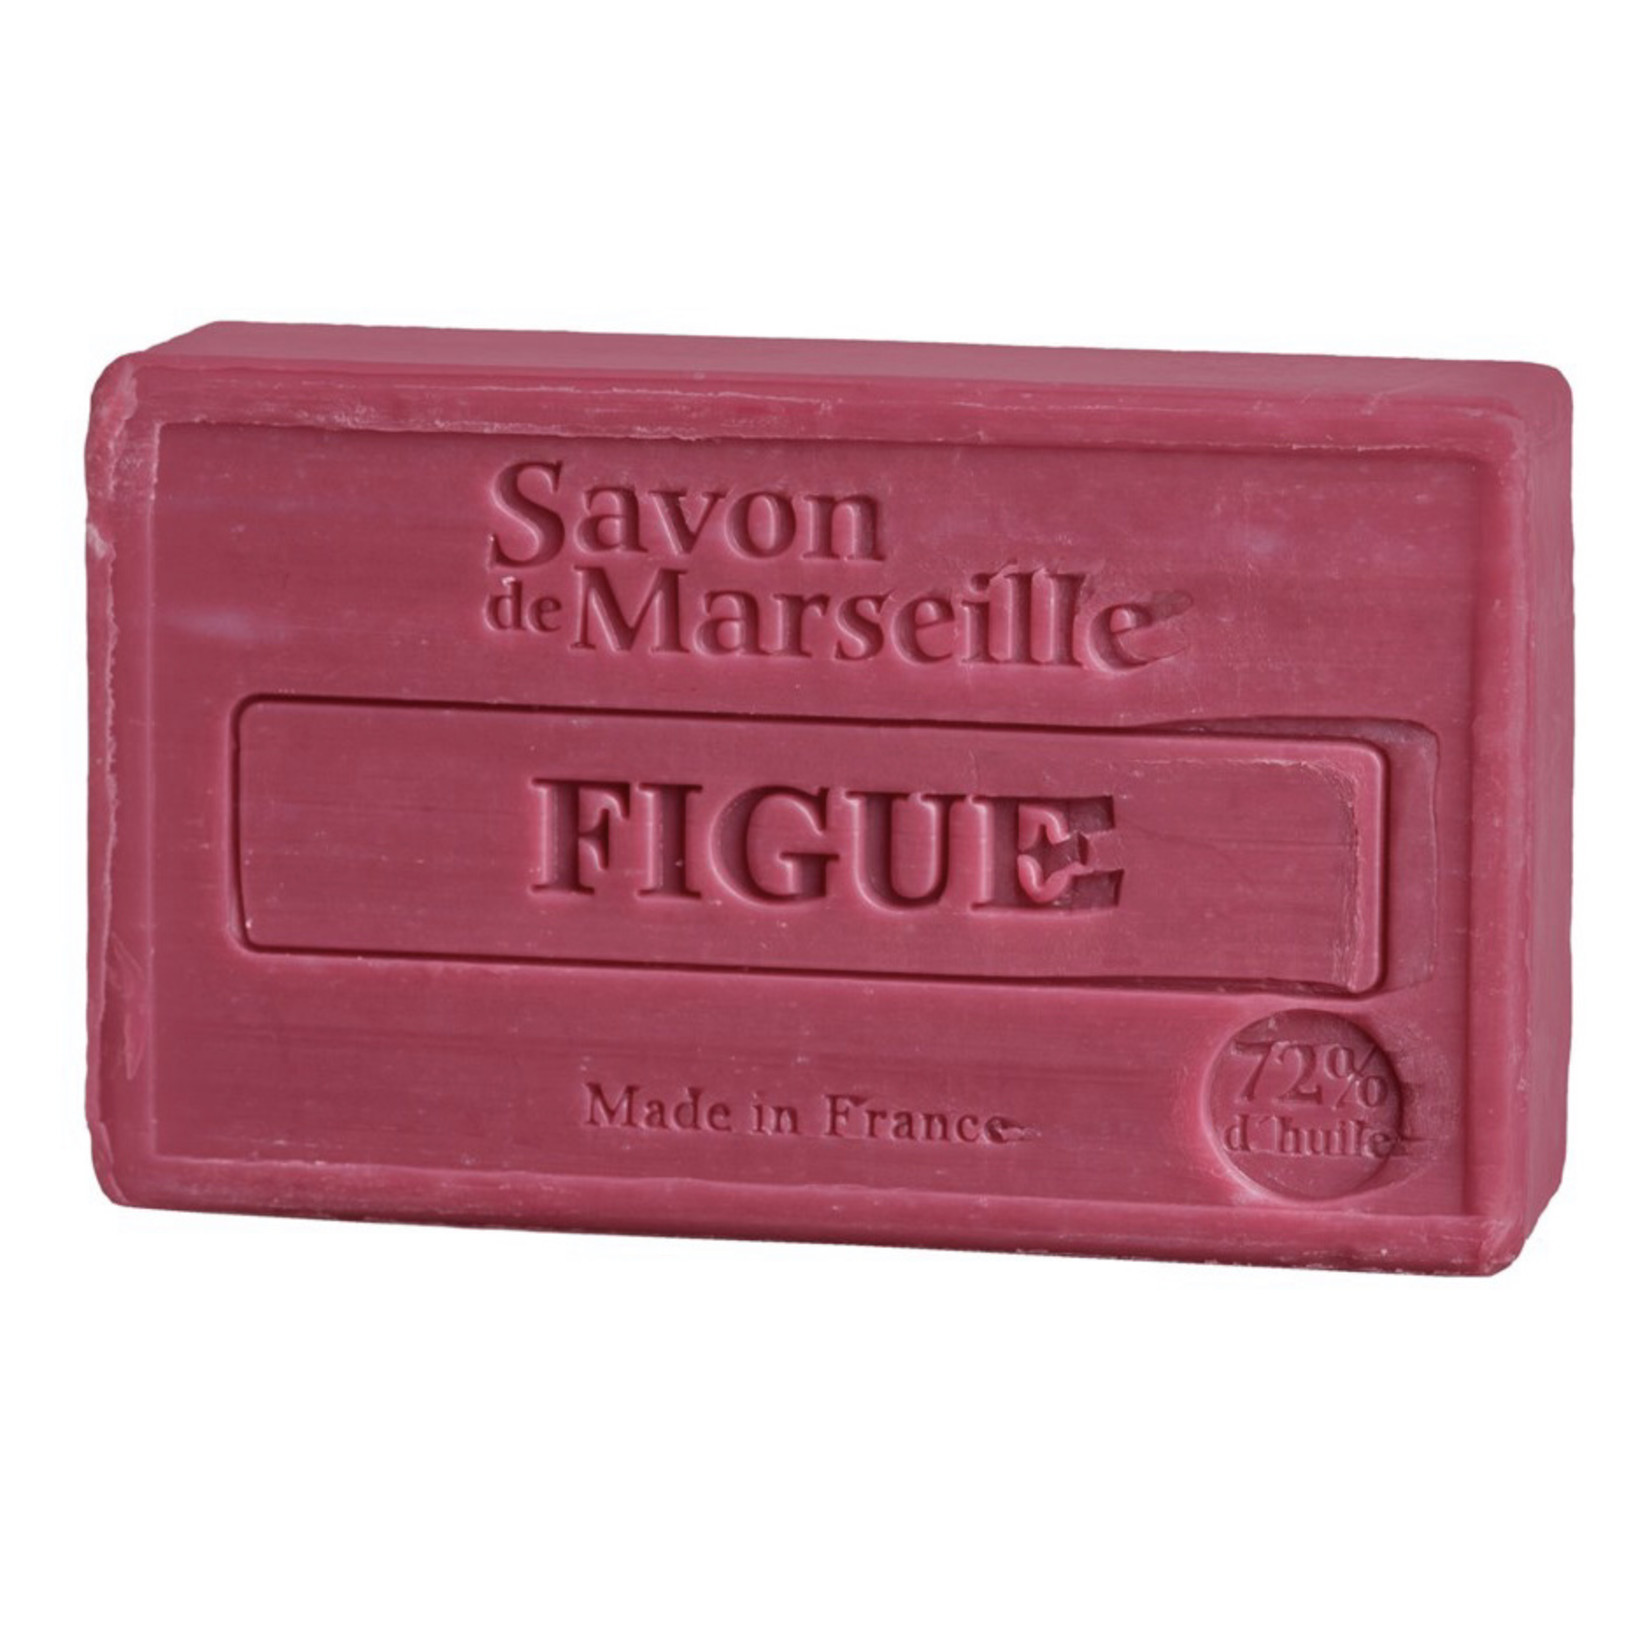 Savon de Marseille Soaps - Made in France (Rectangular)